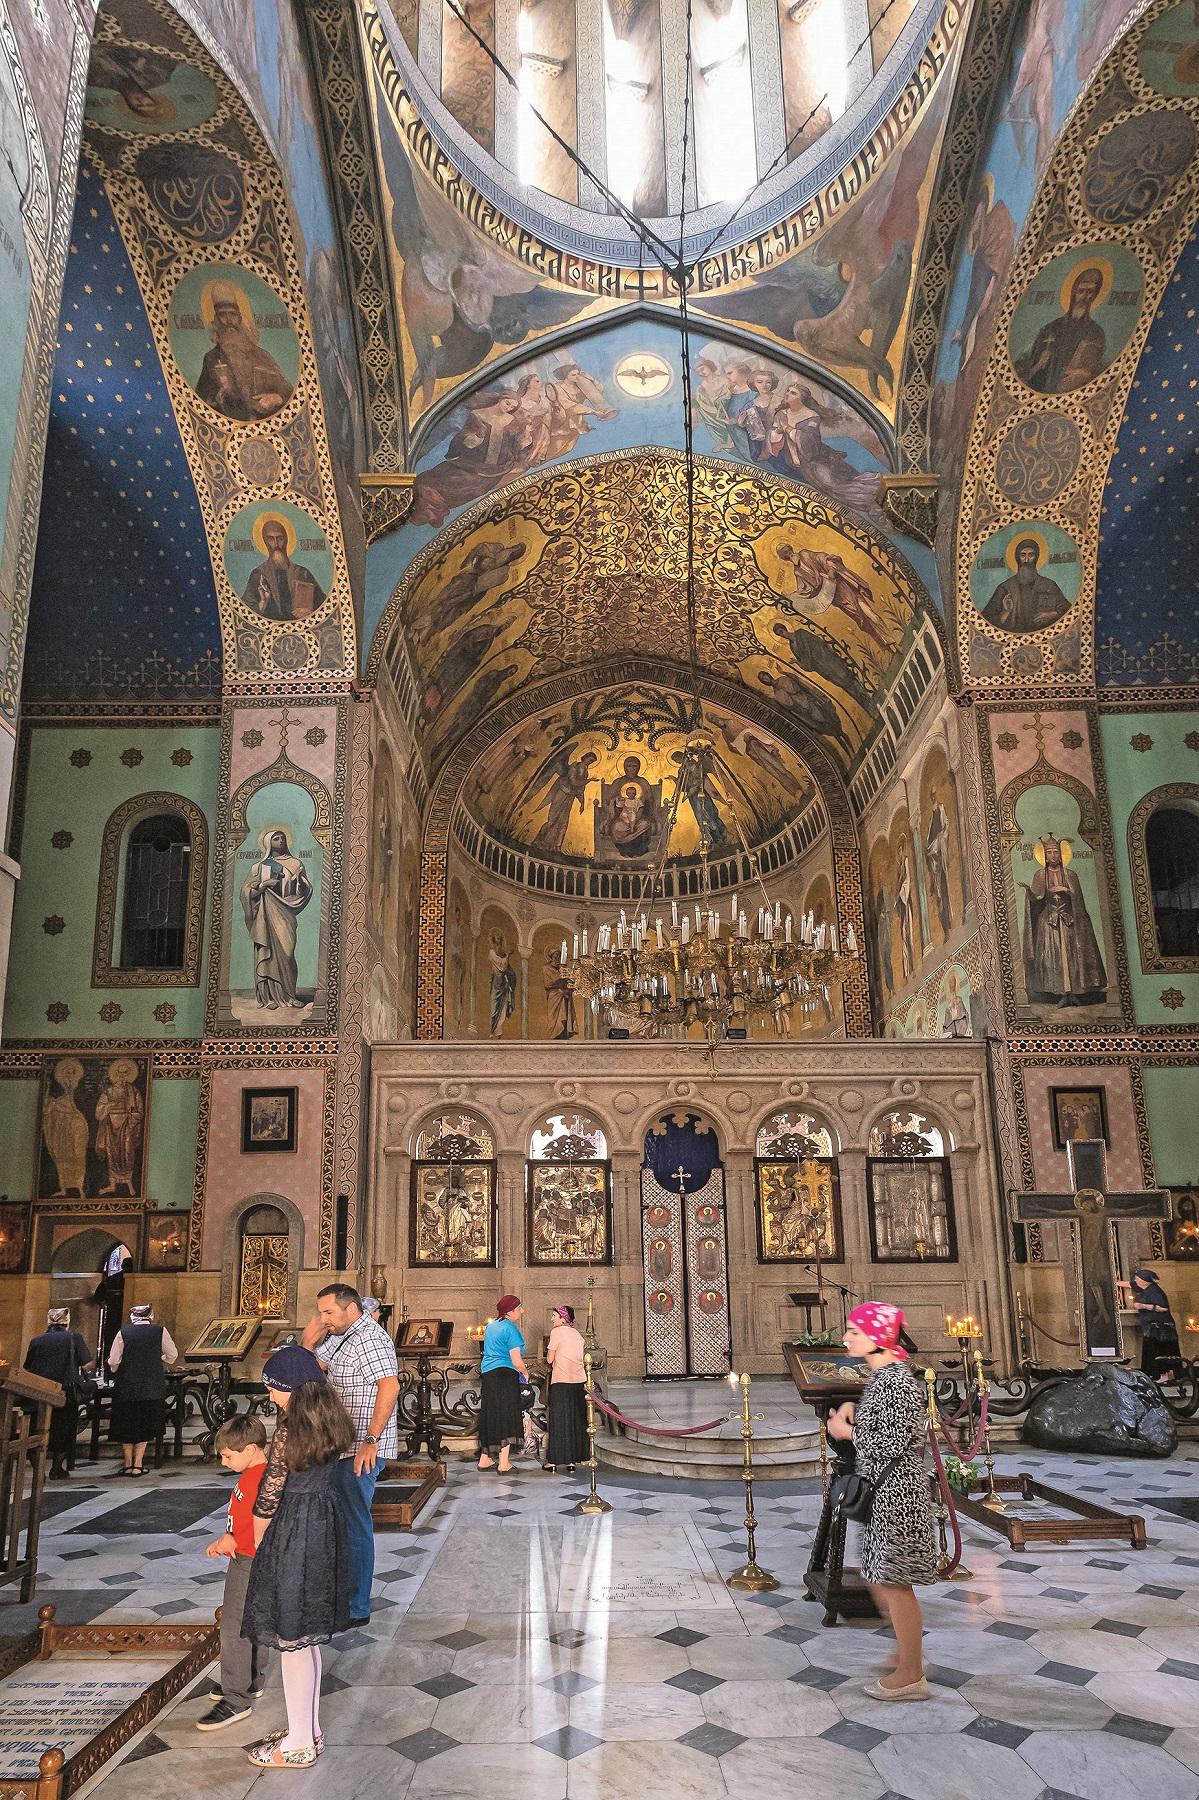 Georgia, Tbilisi, Old Tbilisi or Dzveli Kalaki, Orthodox Sioni Cathedral of the Dormition